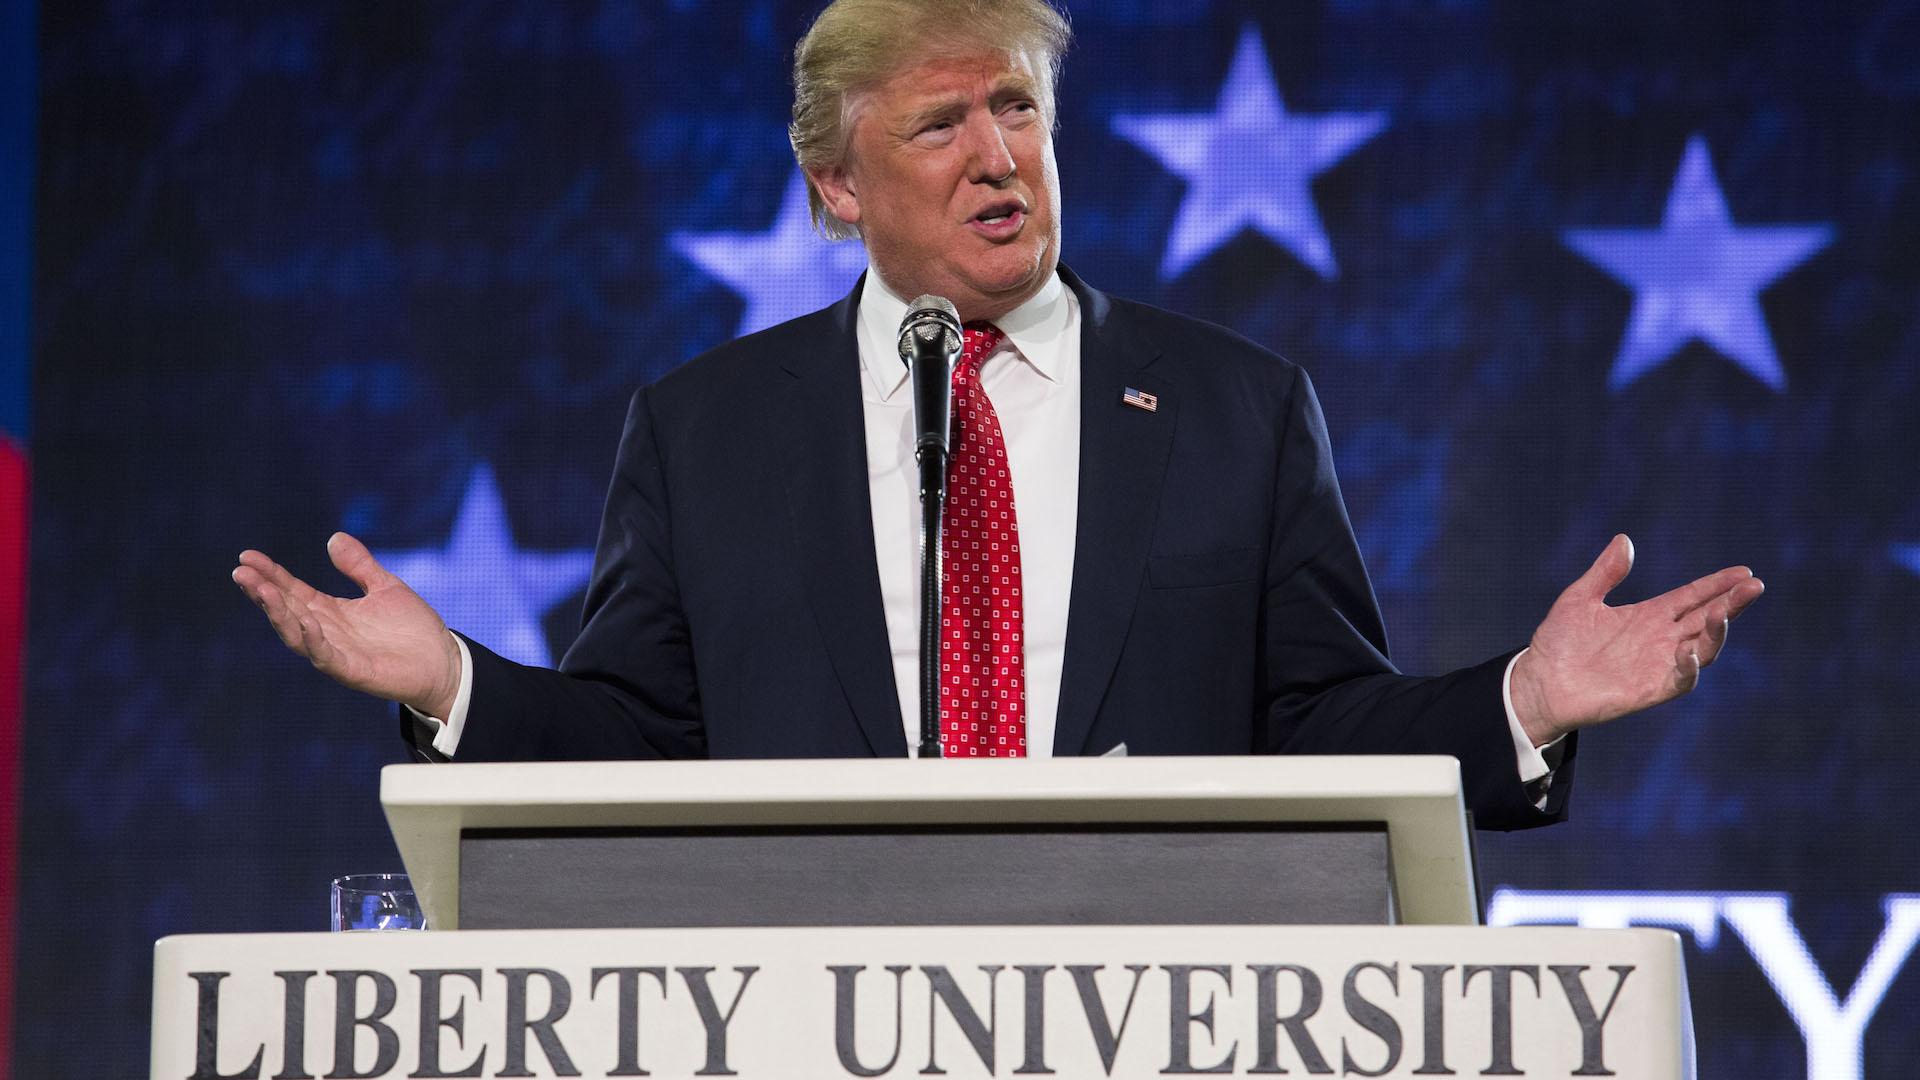 Evangelical leader Jerry Falwell Jr. endorses Trump